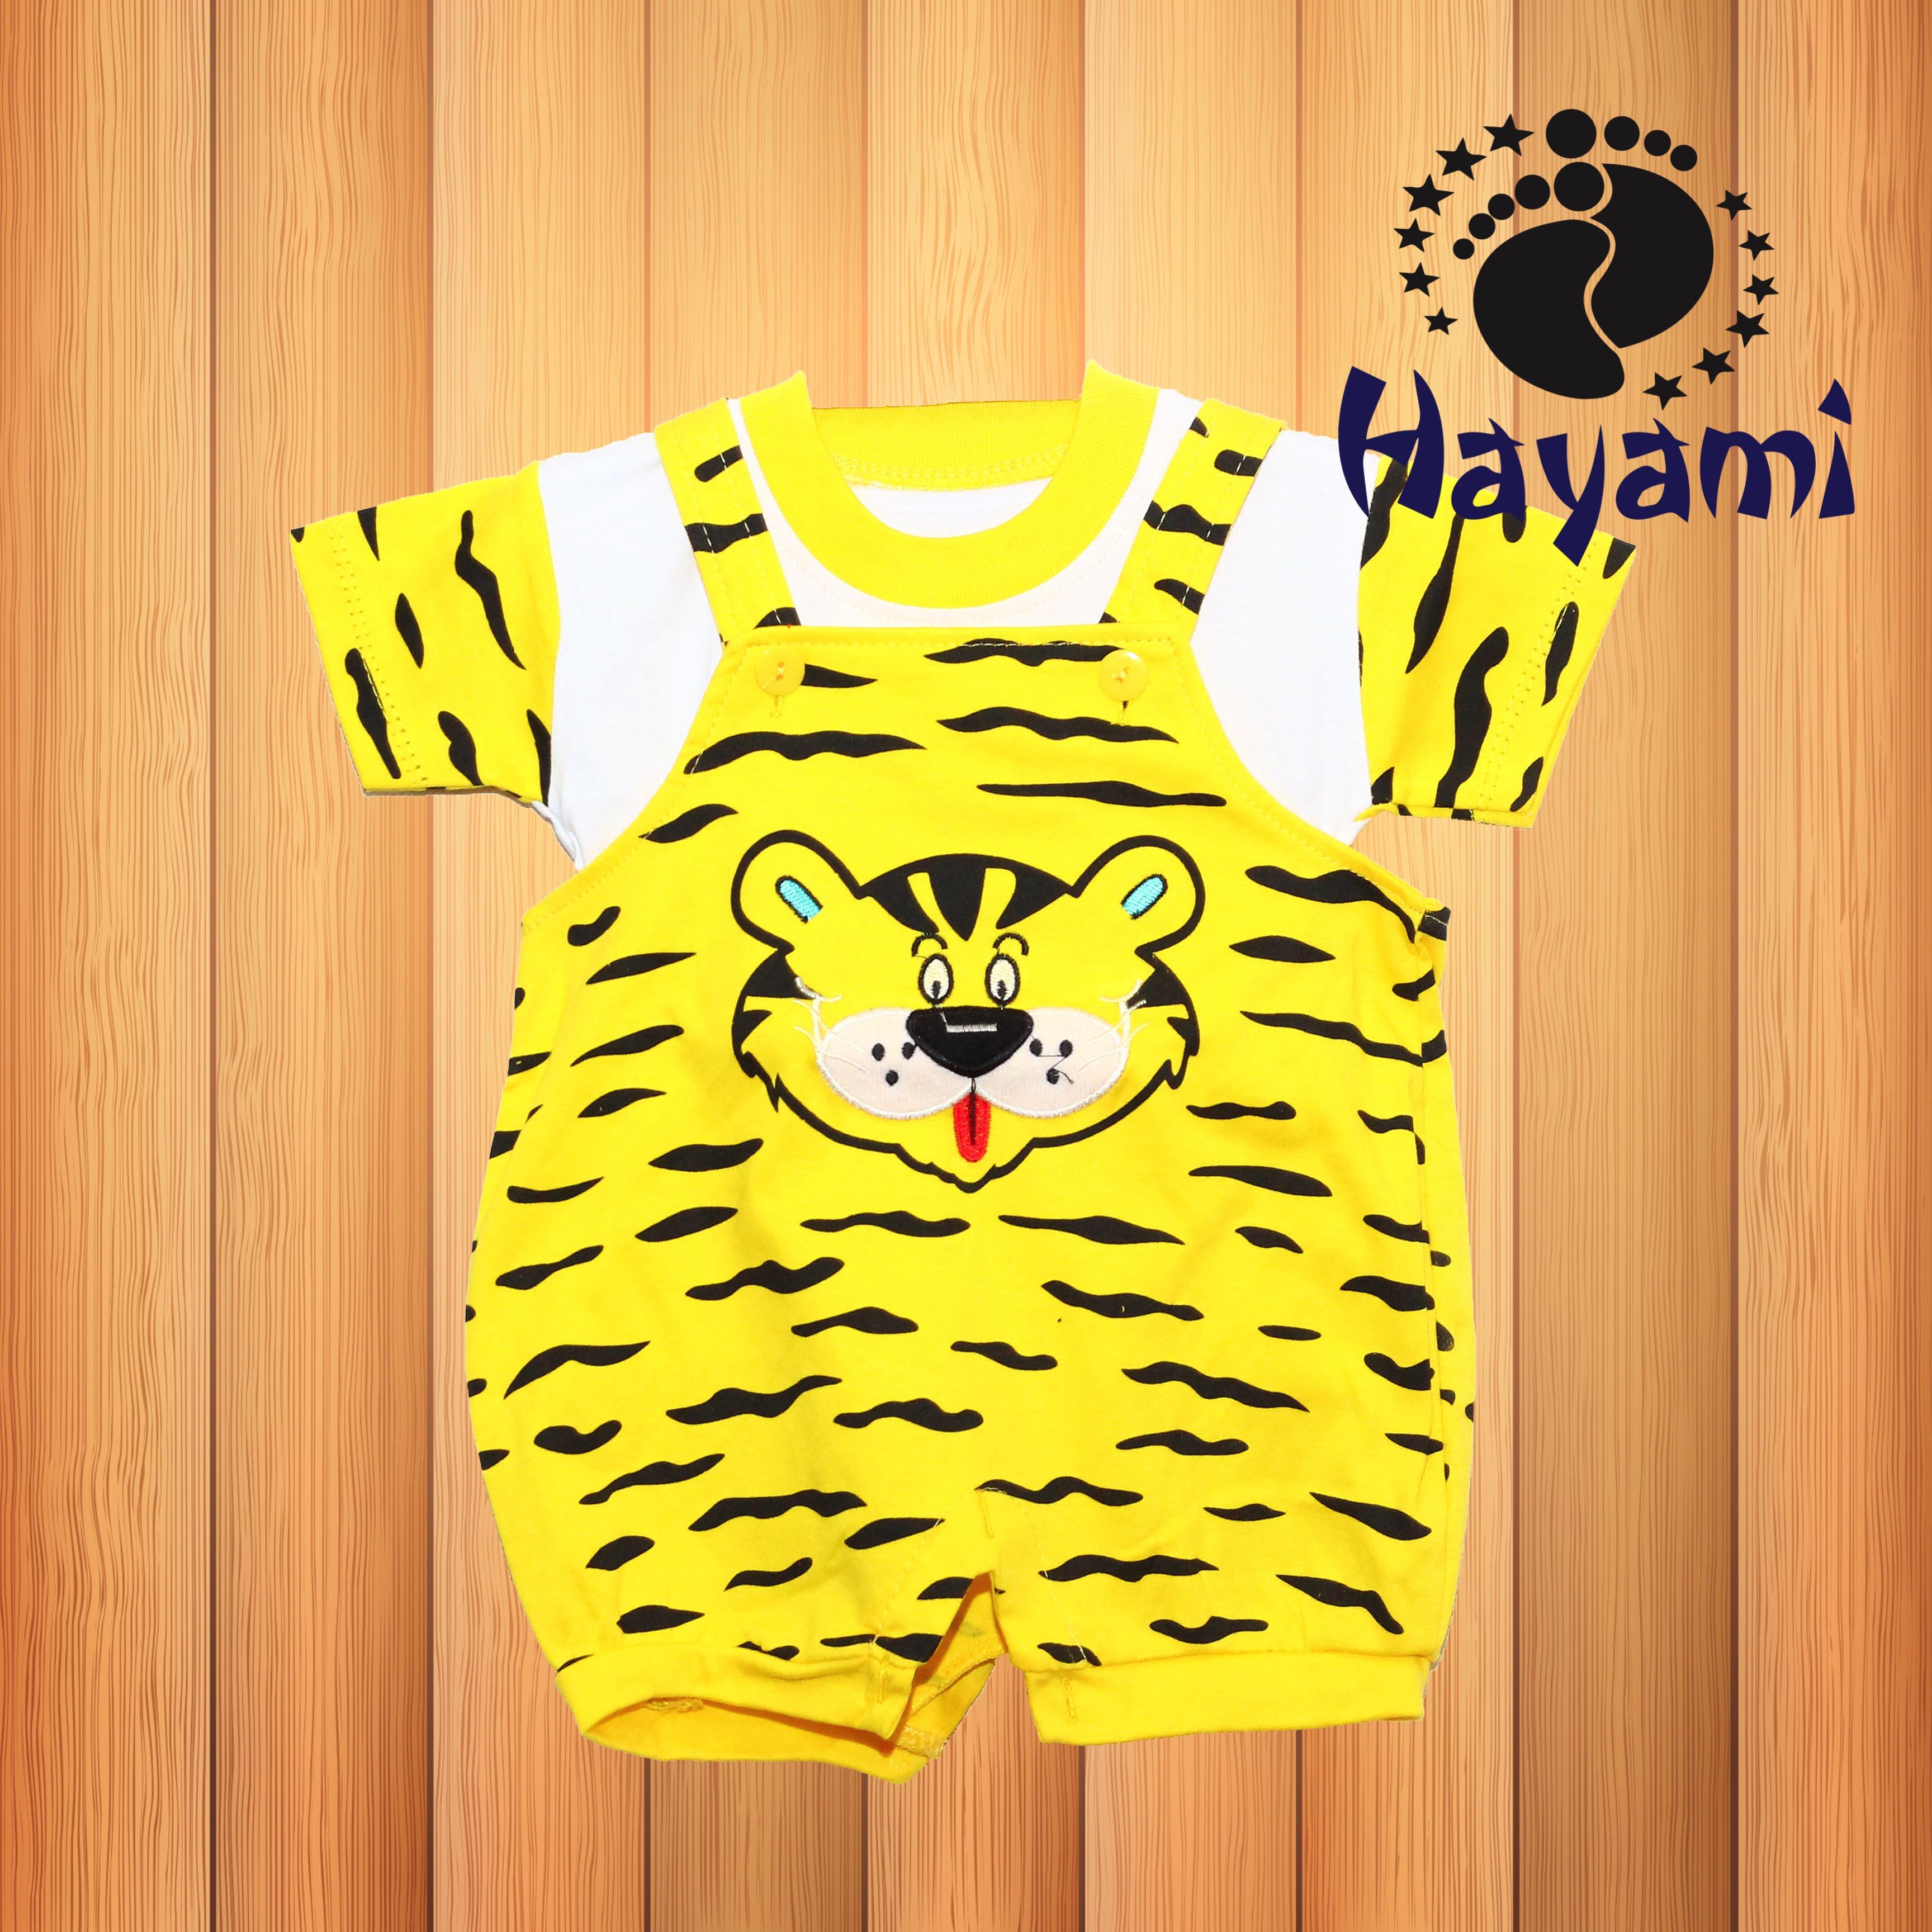 Hayamiid Shop Line Baju Kodok Bayi Allsize 2 12 Bulan Macan Loreng 4w